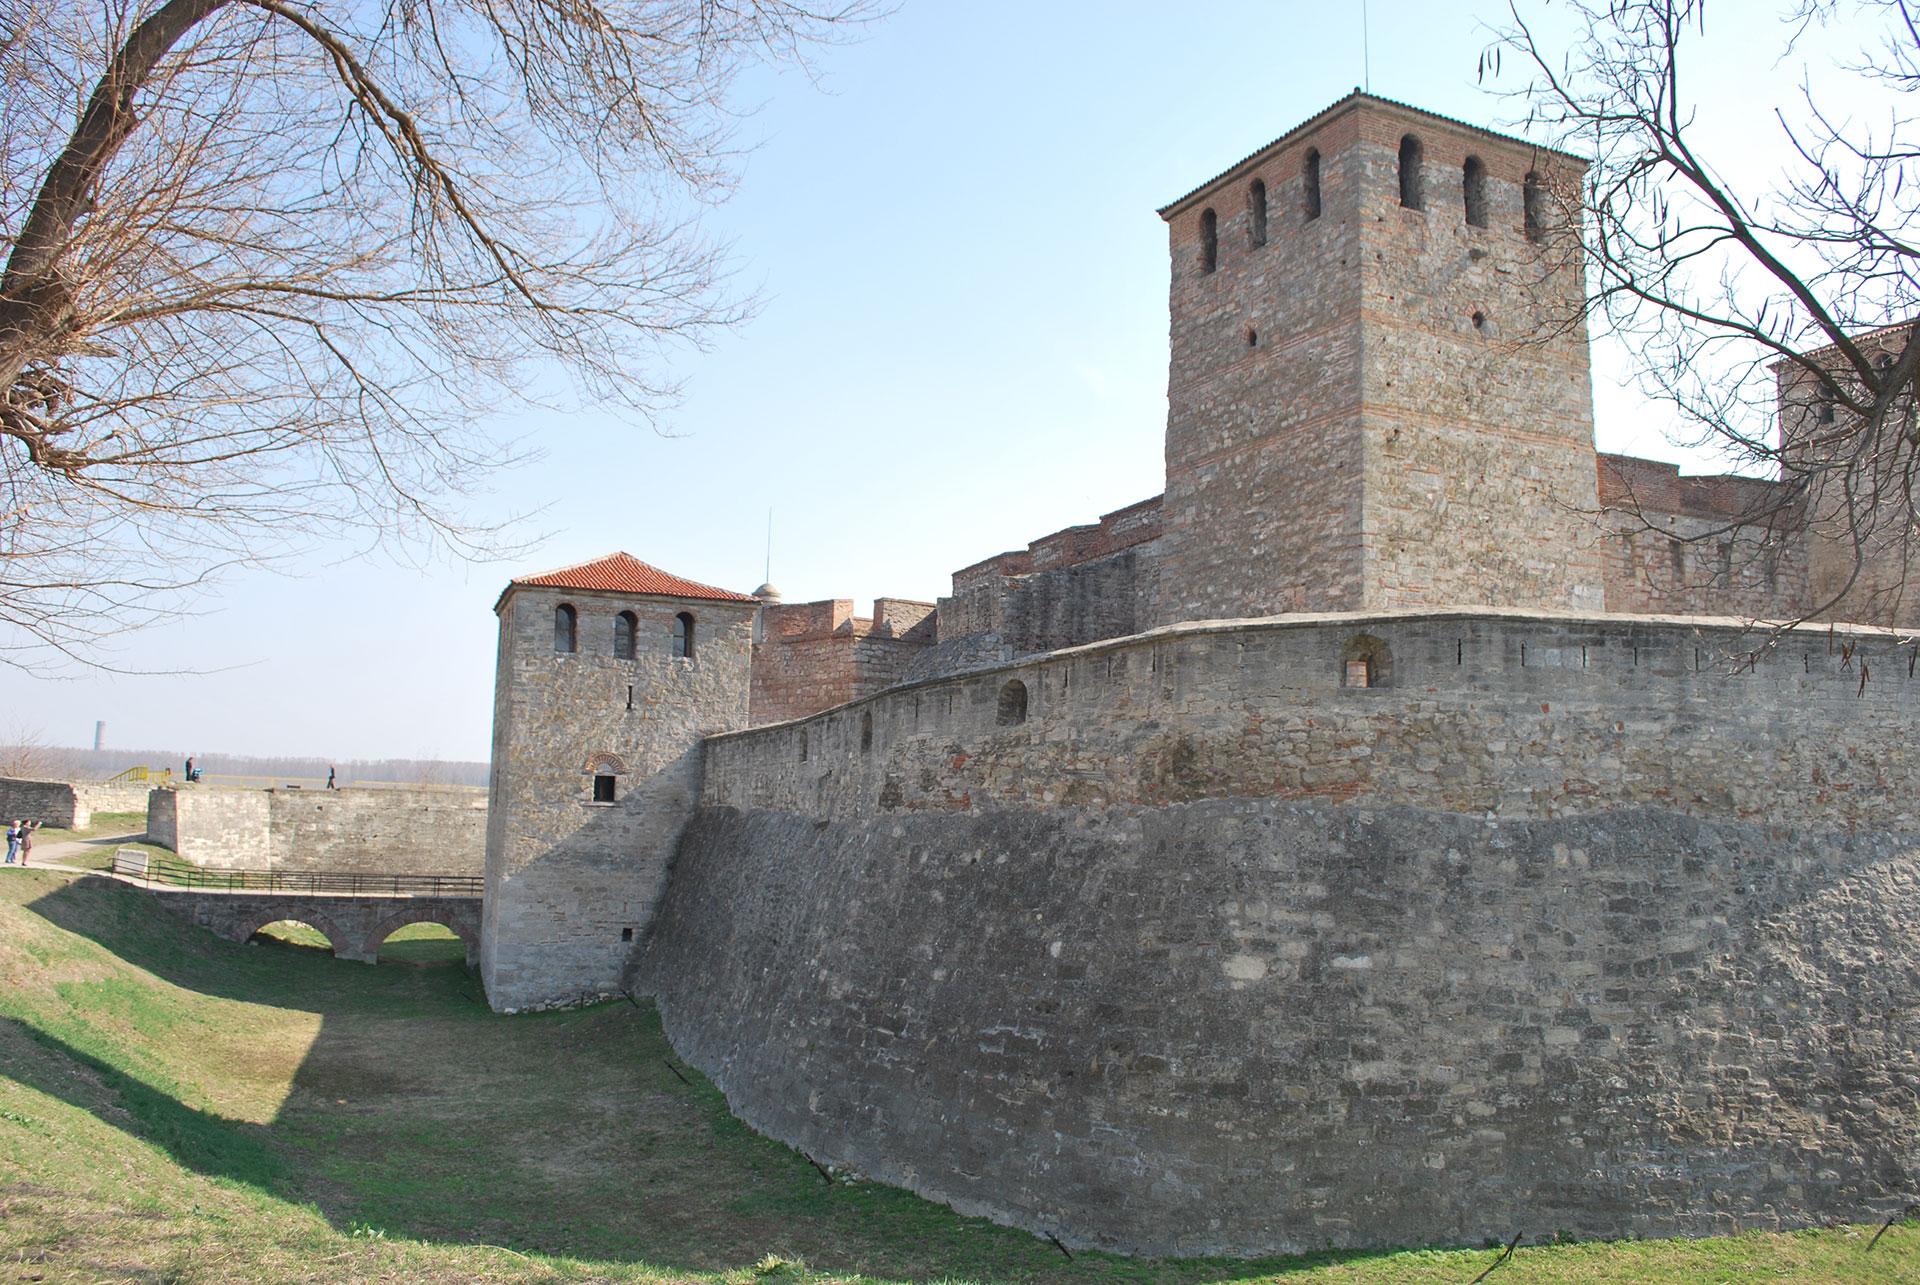 Mediaeval-Bulgarian-Fortress-Baba-Vida_24